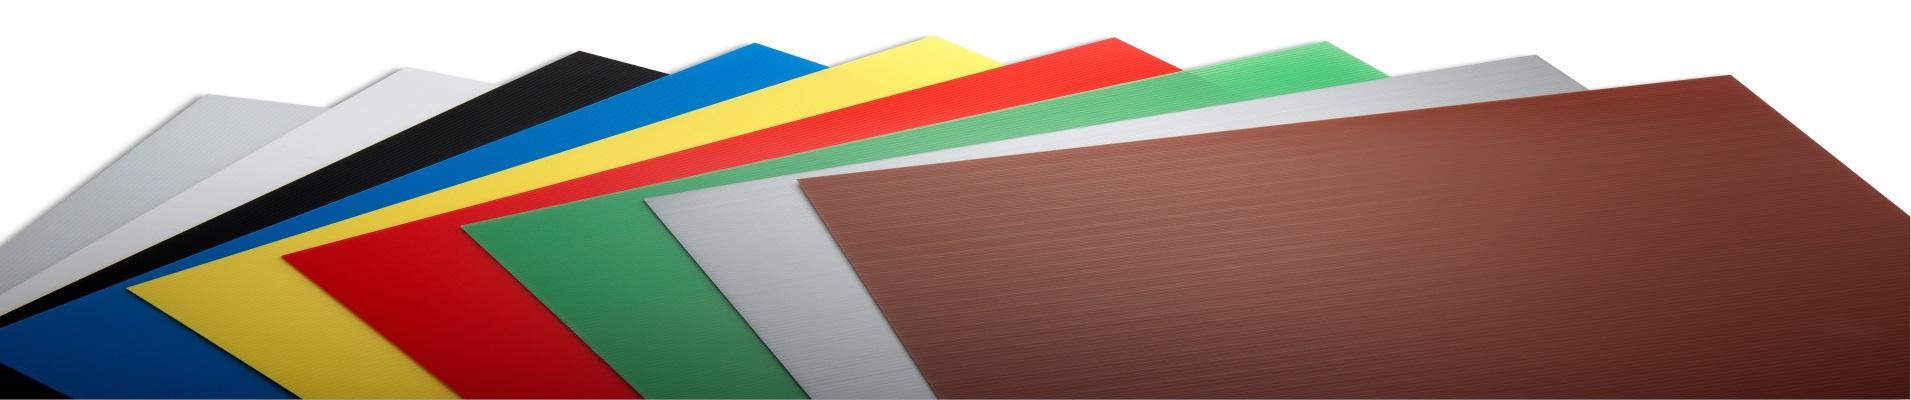 Plastonda-saćaste polipropilenske ploče